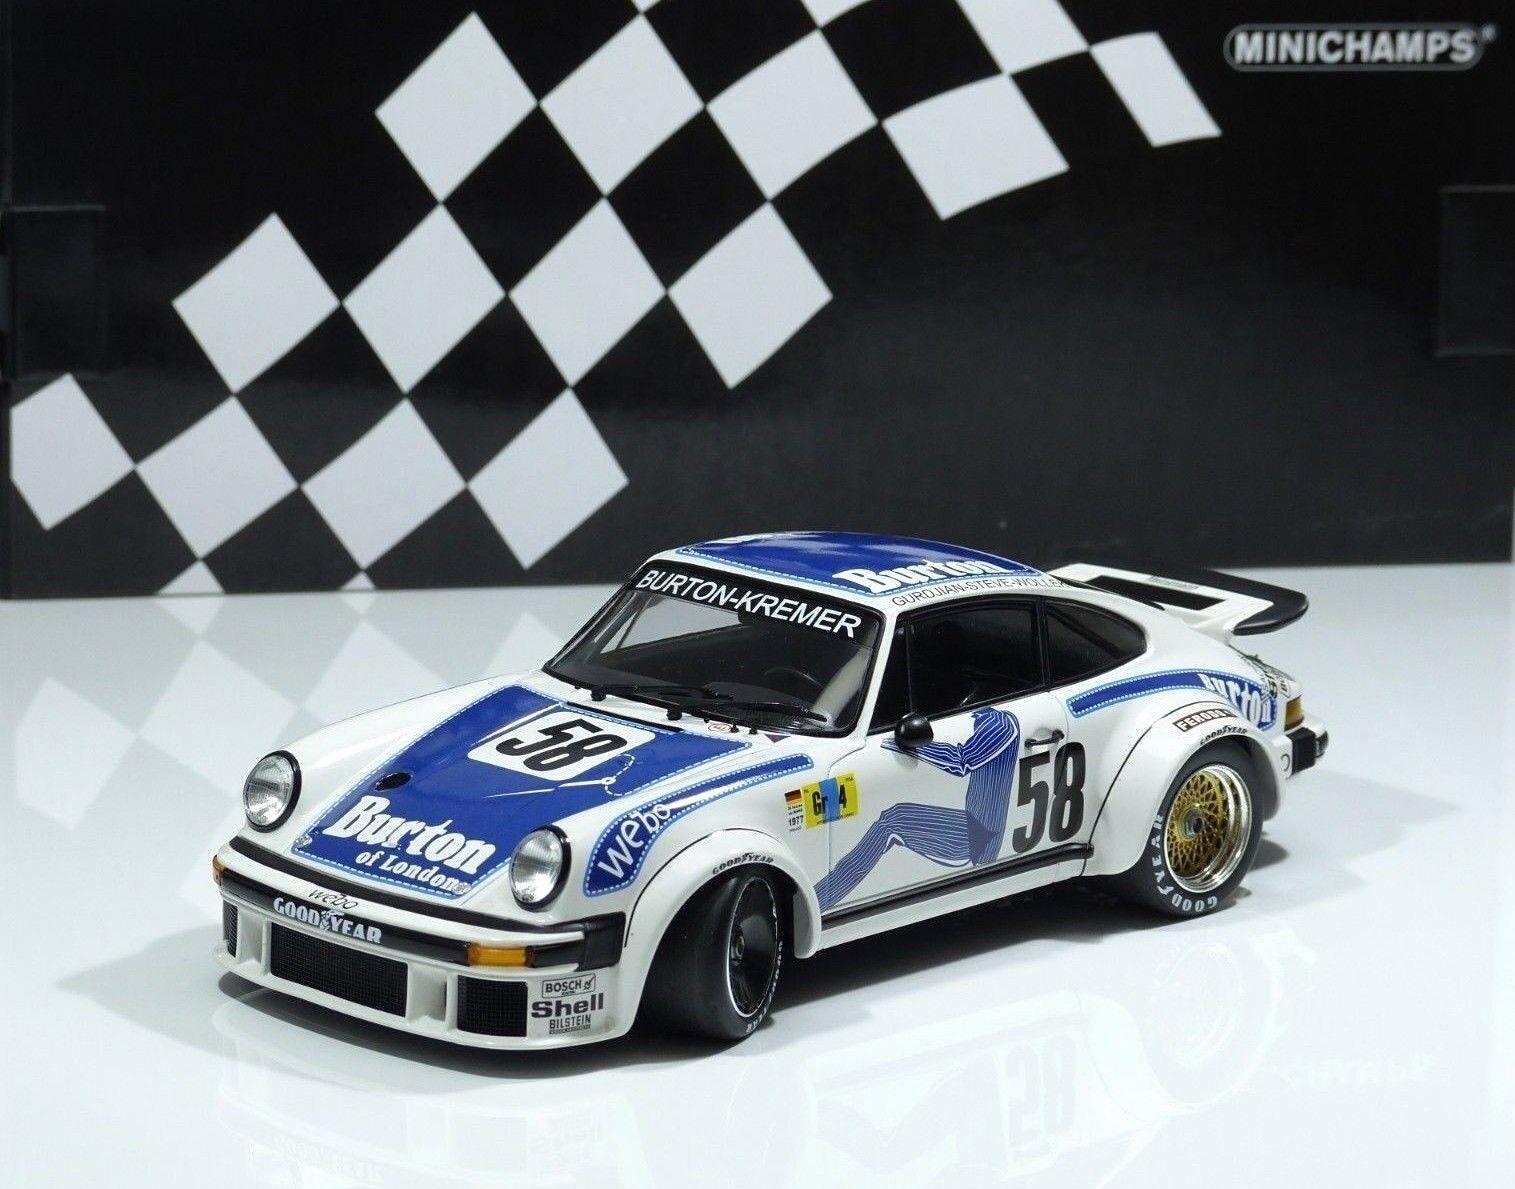 Porsche 934 Kremer 24 H LE MANS 1977  58 Wollek, Gurdjian, Steve MINICHAMPS 1 18